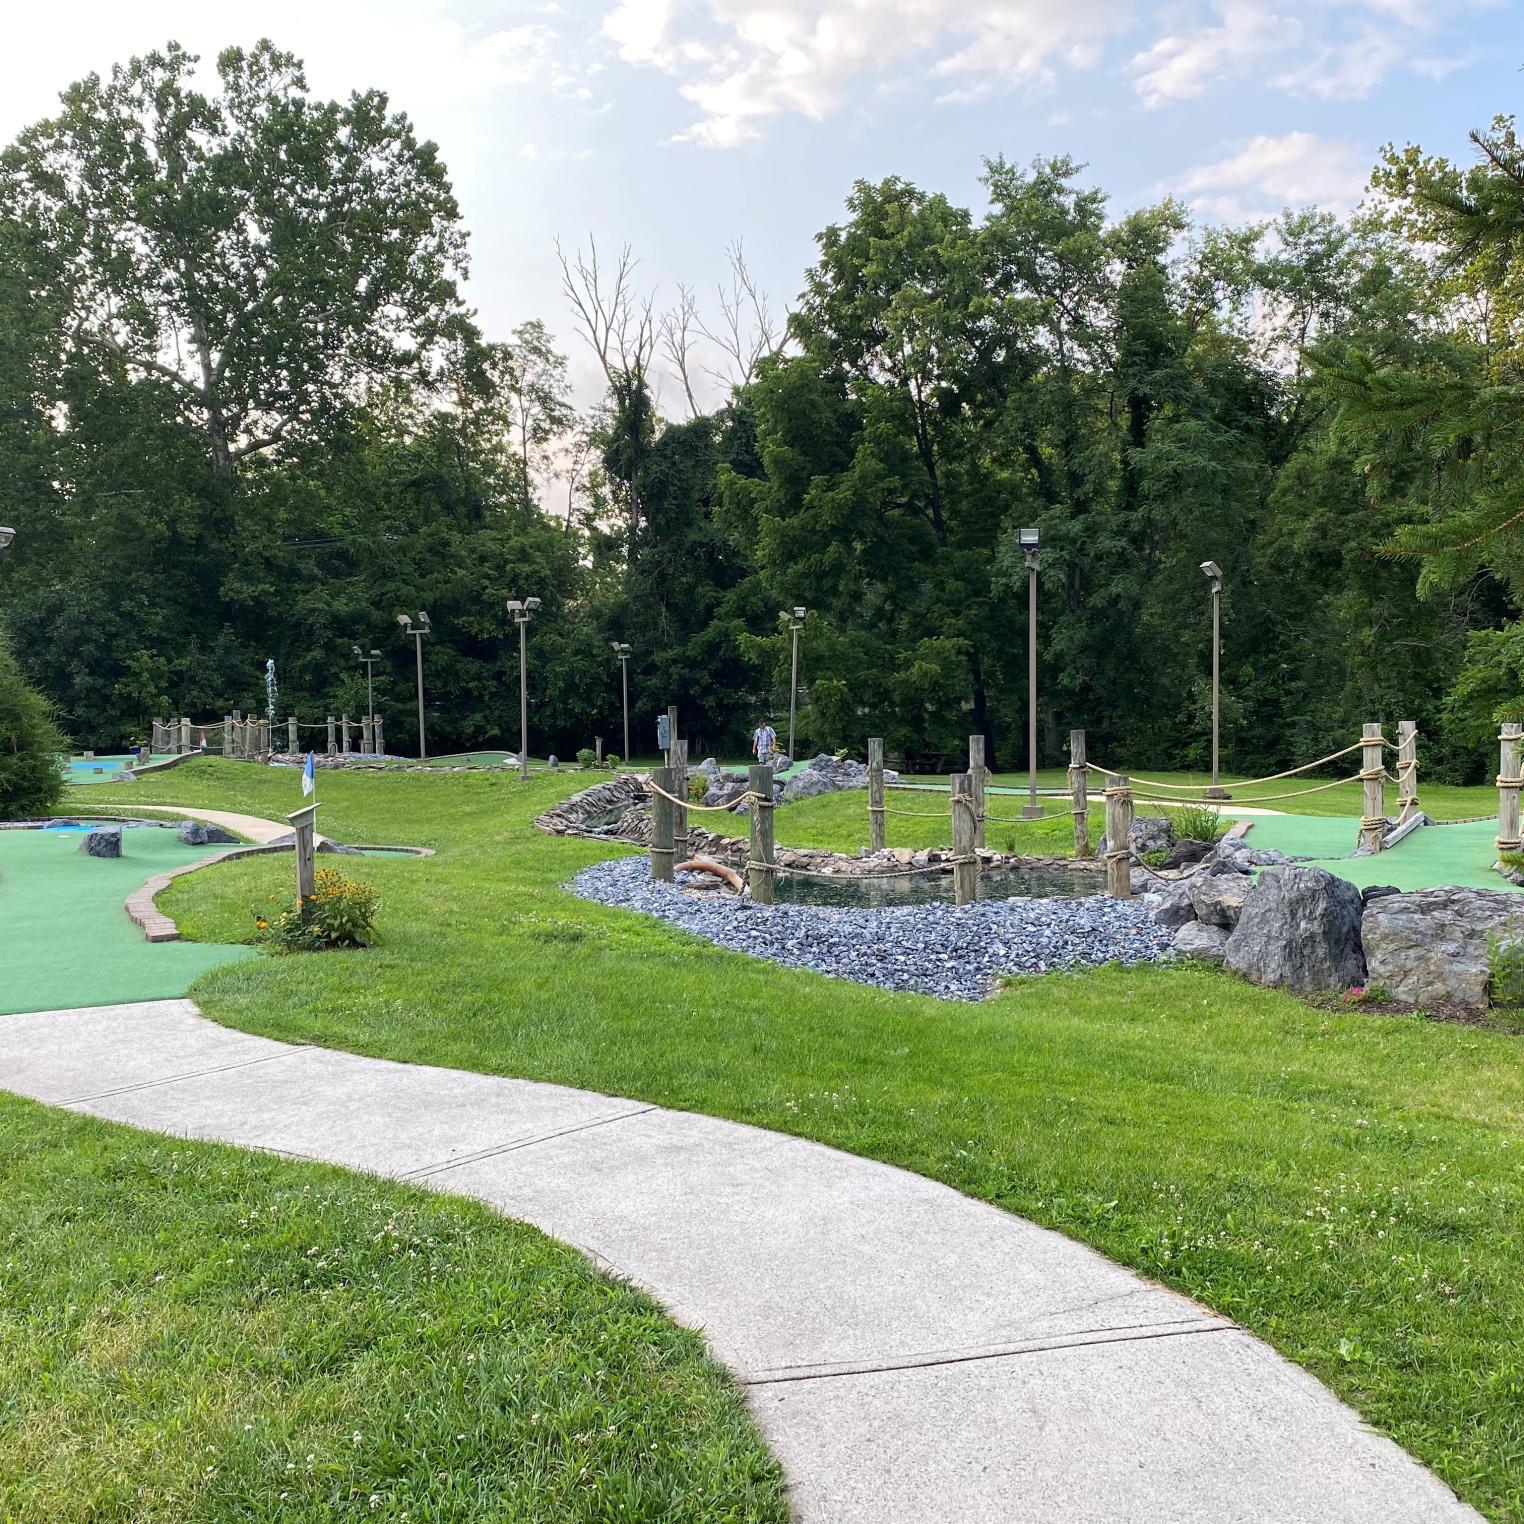 Mini Golf at Liberty Forge